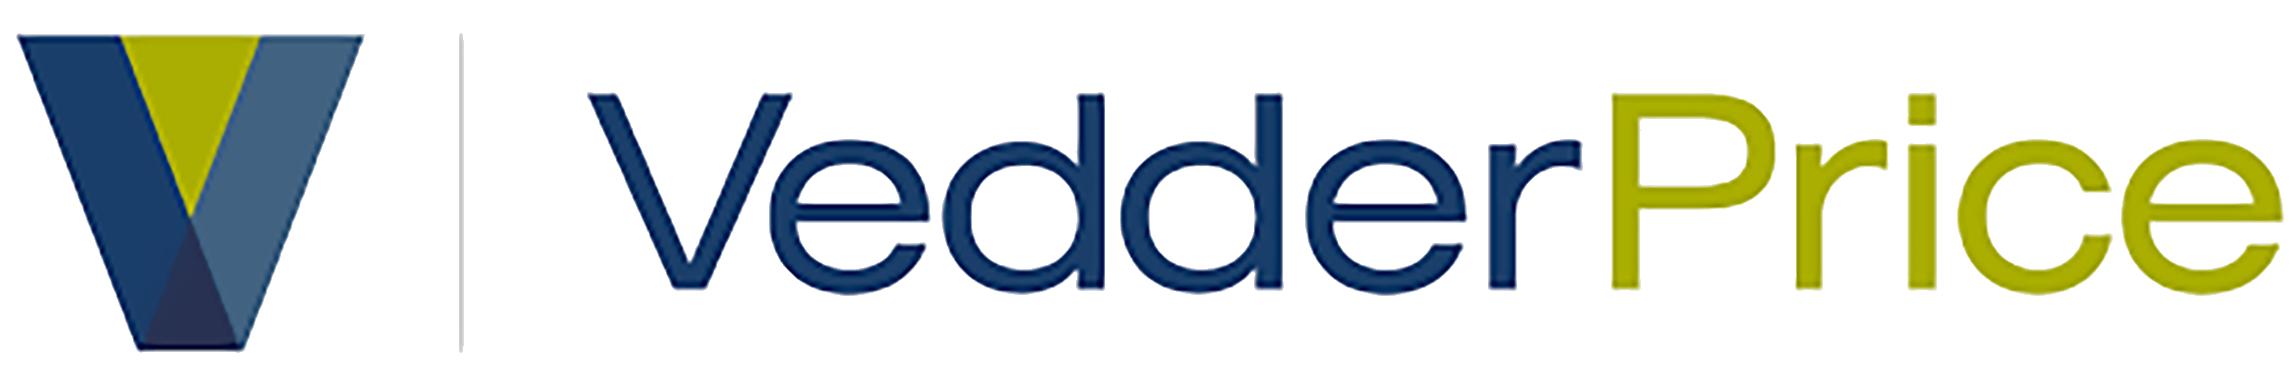 Event Bronze Sponsors - Vedder Price - Logo